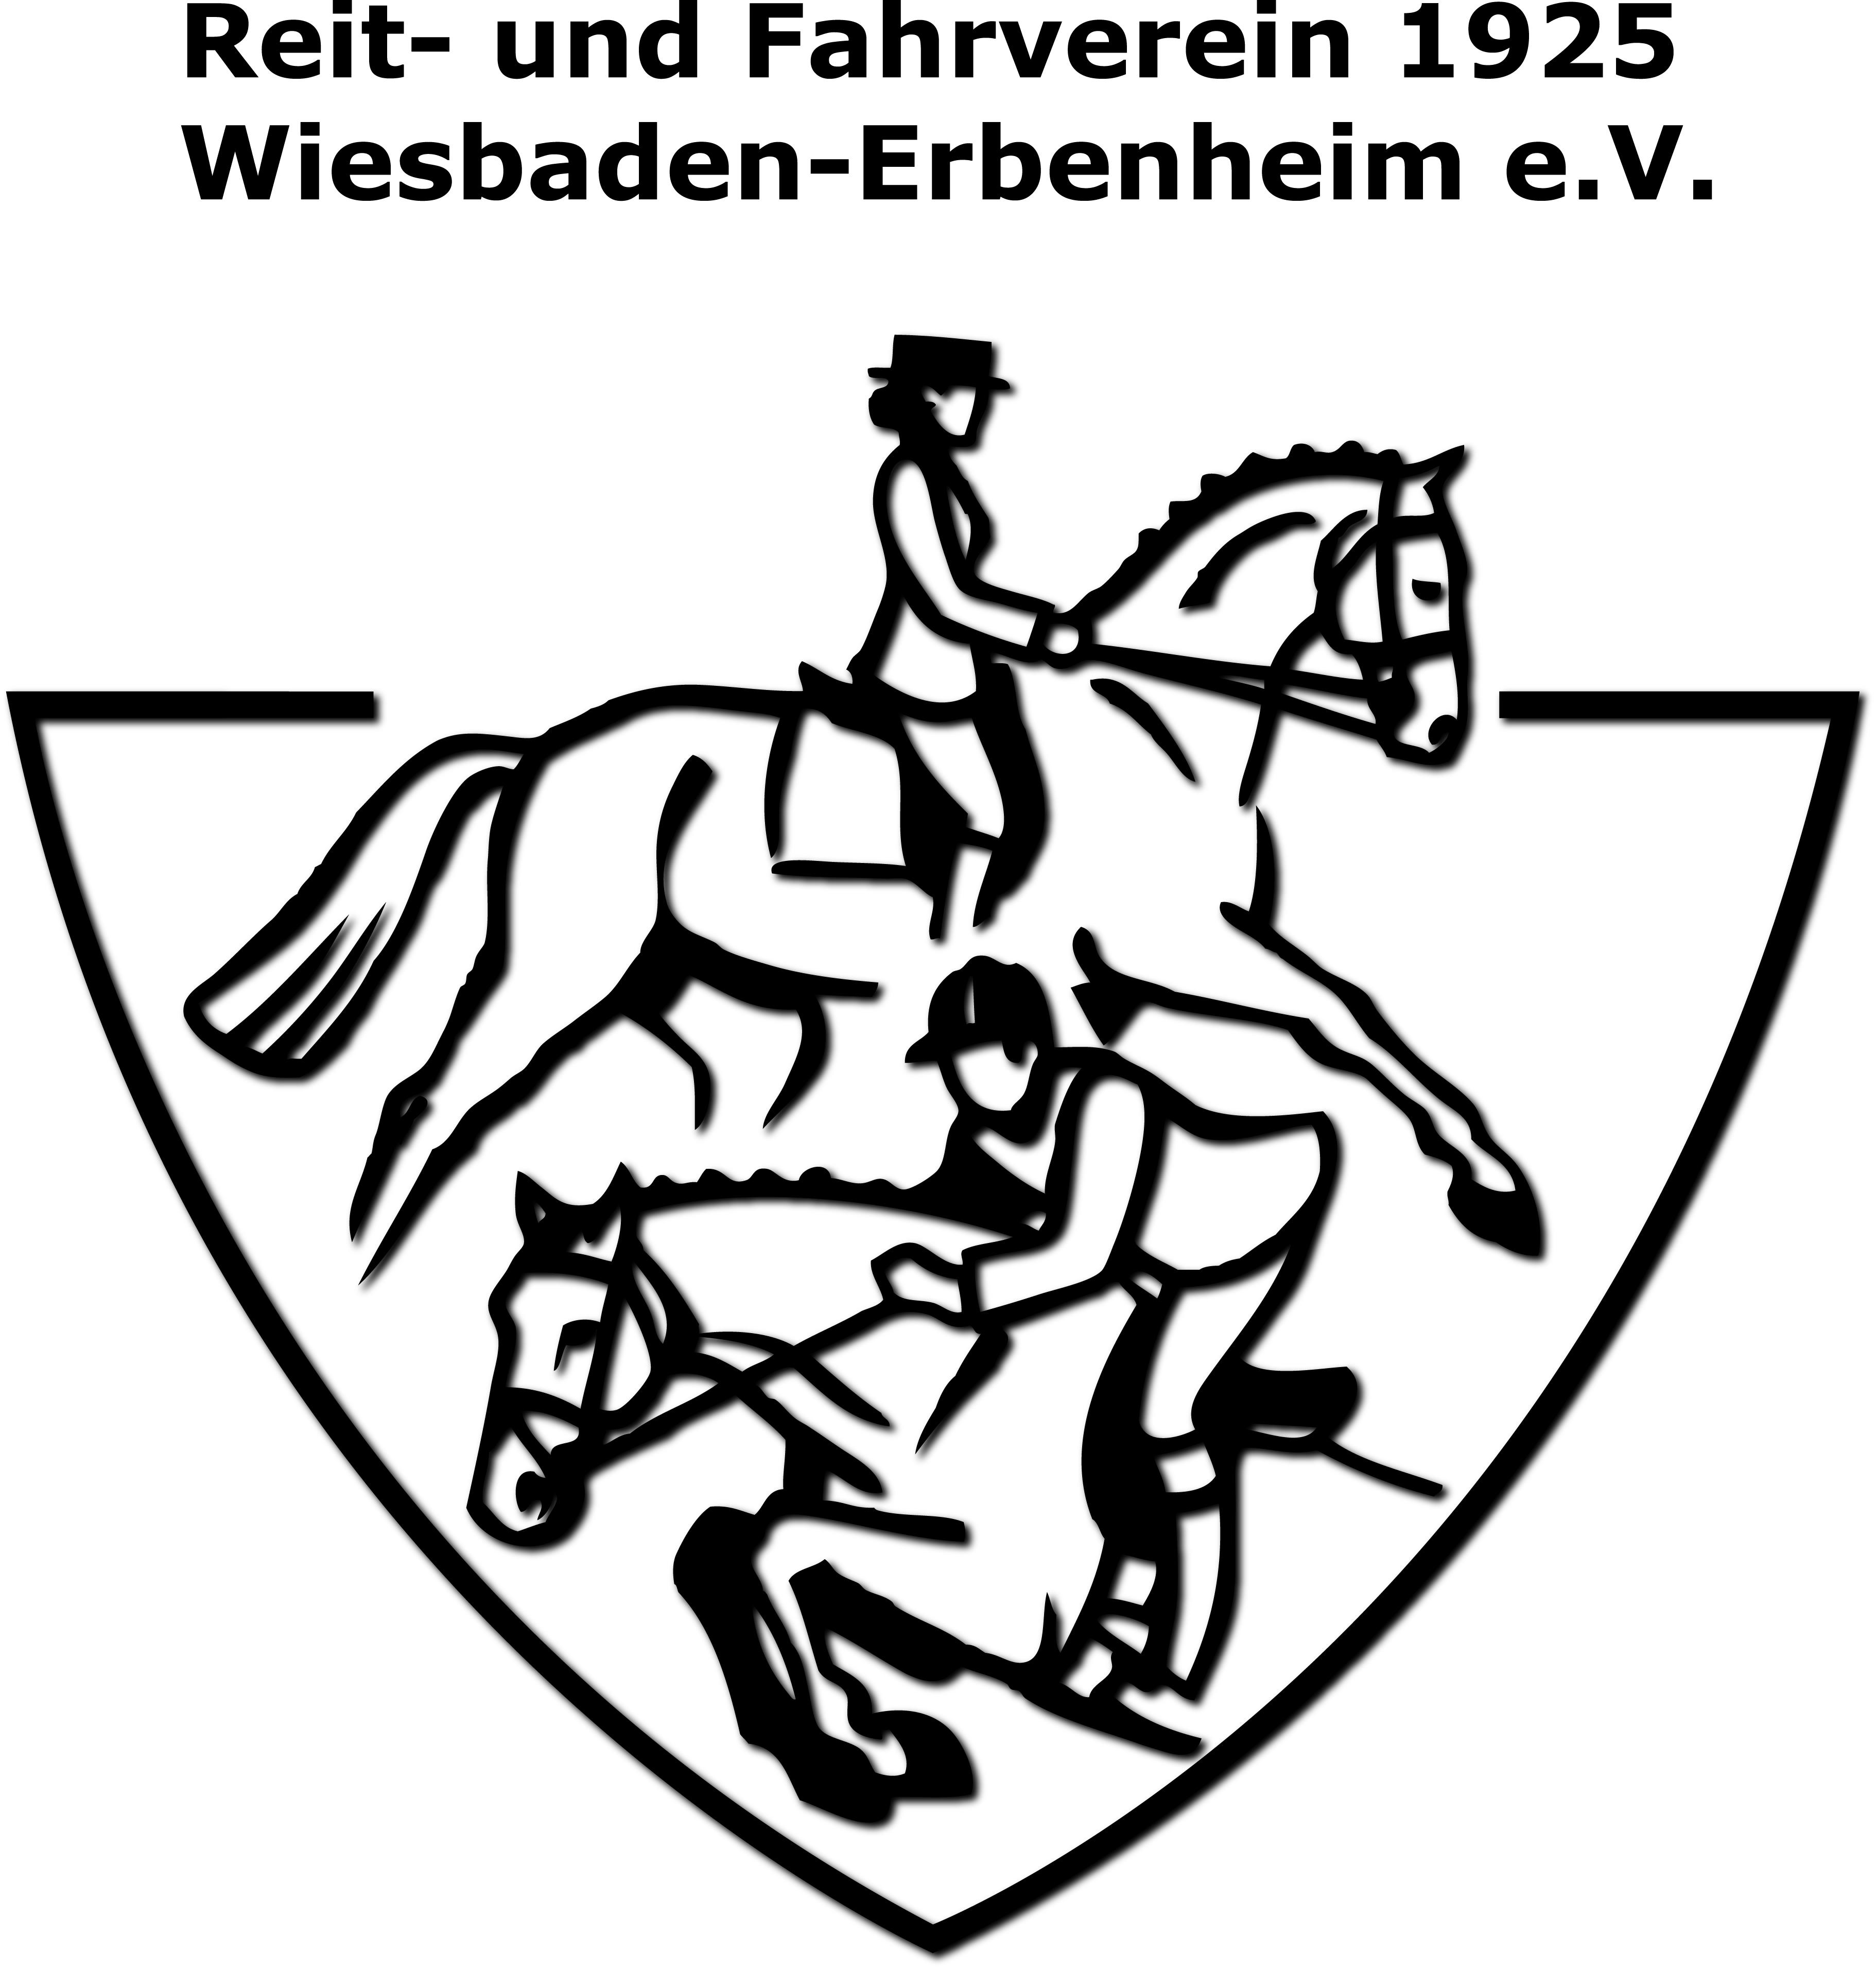 RuFV Wiesbaden Erbenheim